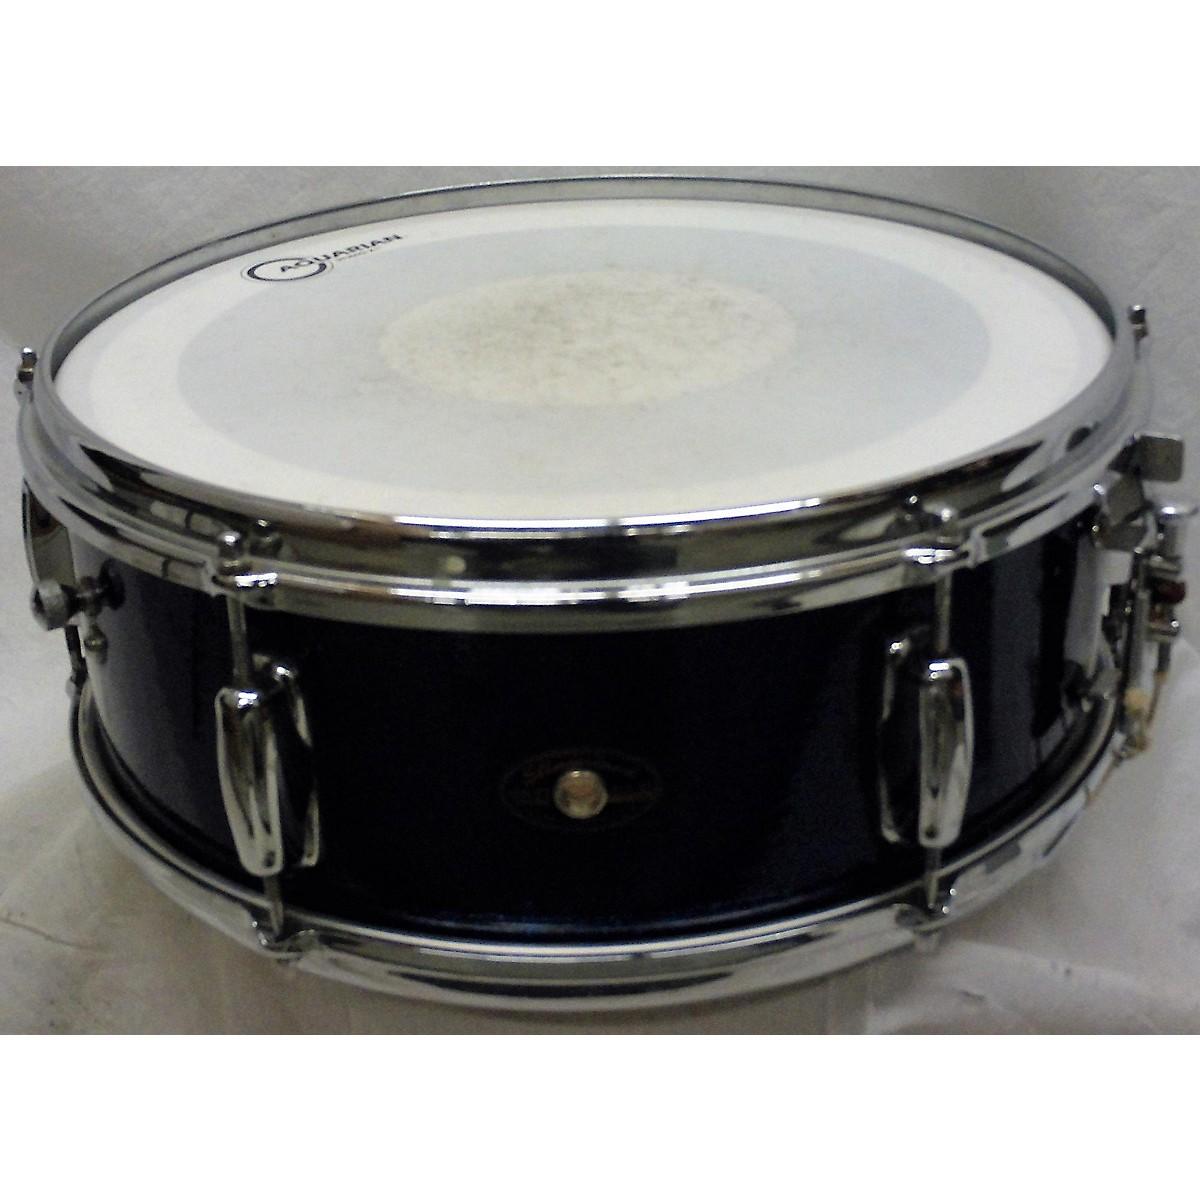 Slingerland 1963 5X14 Snare Drum